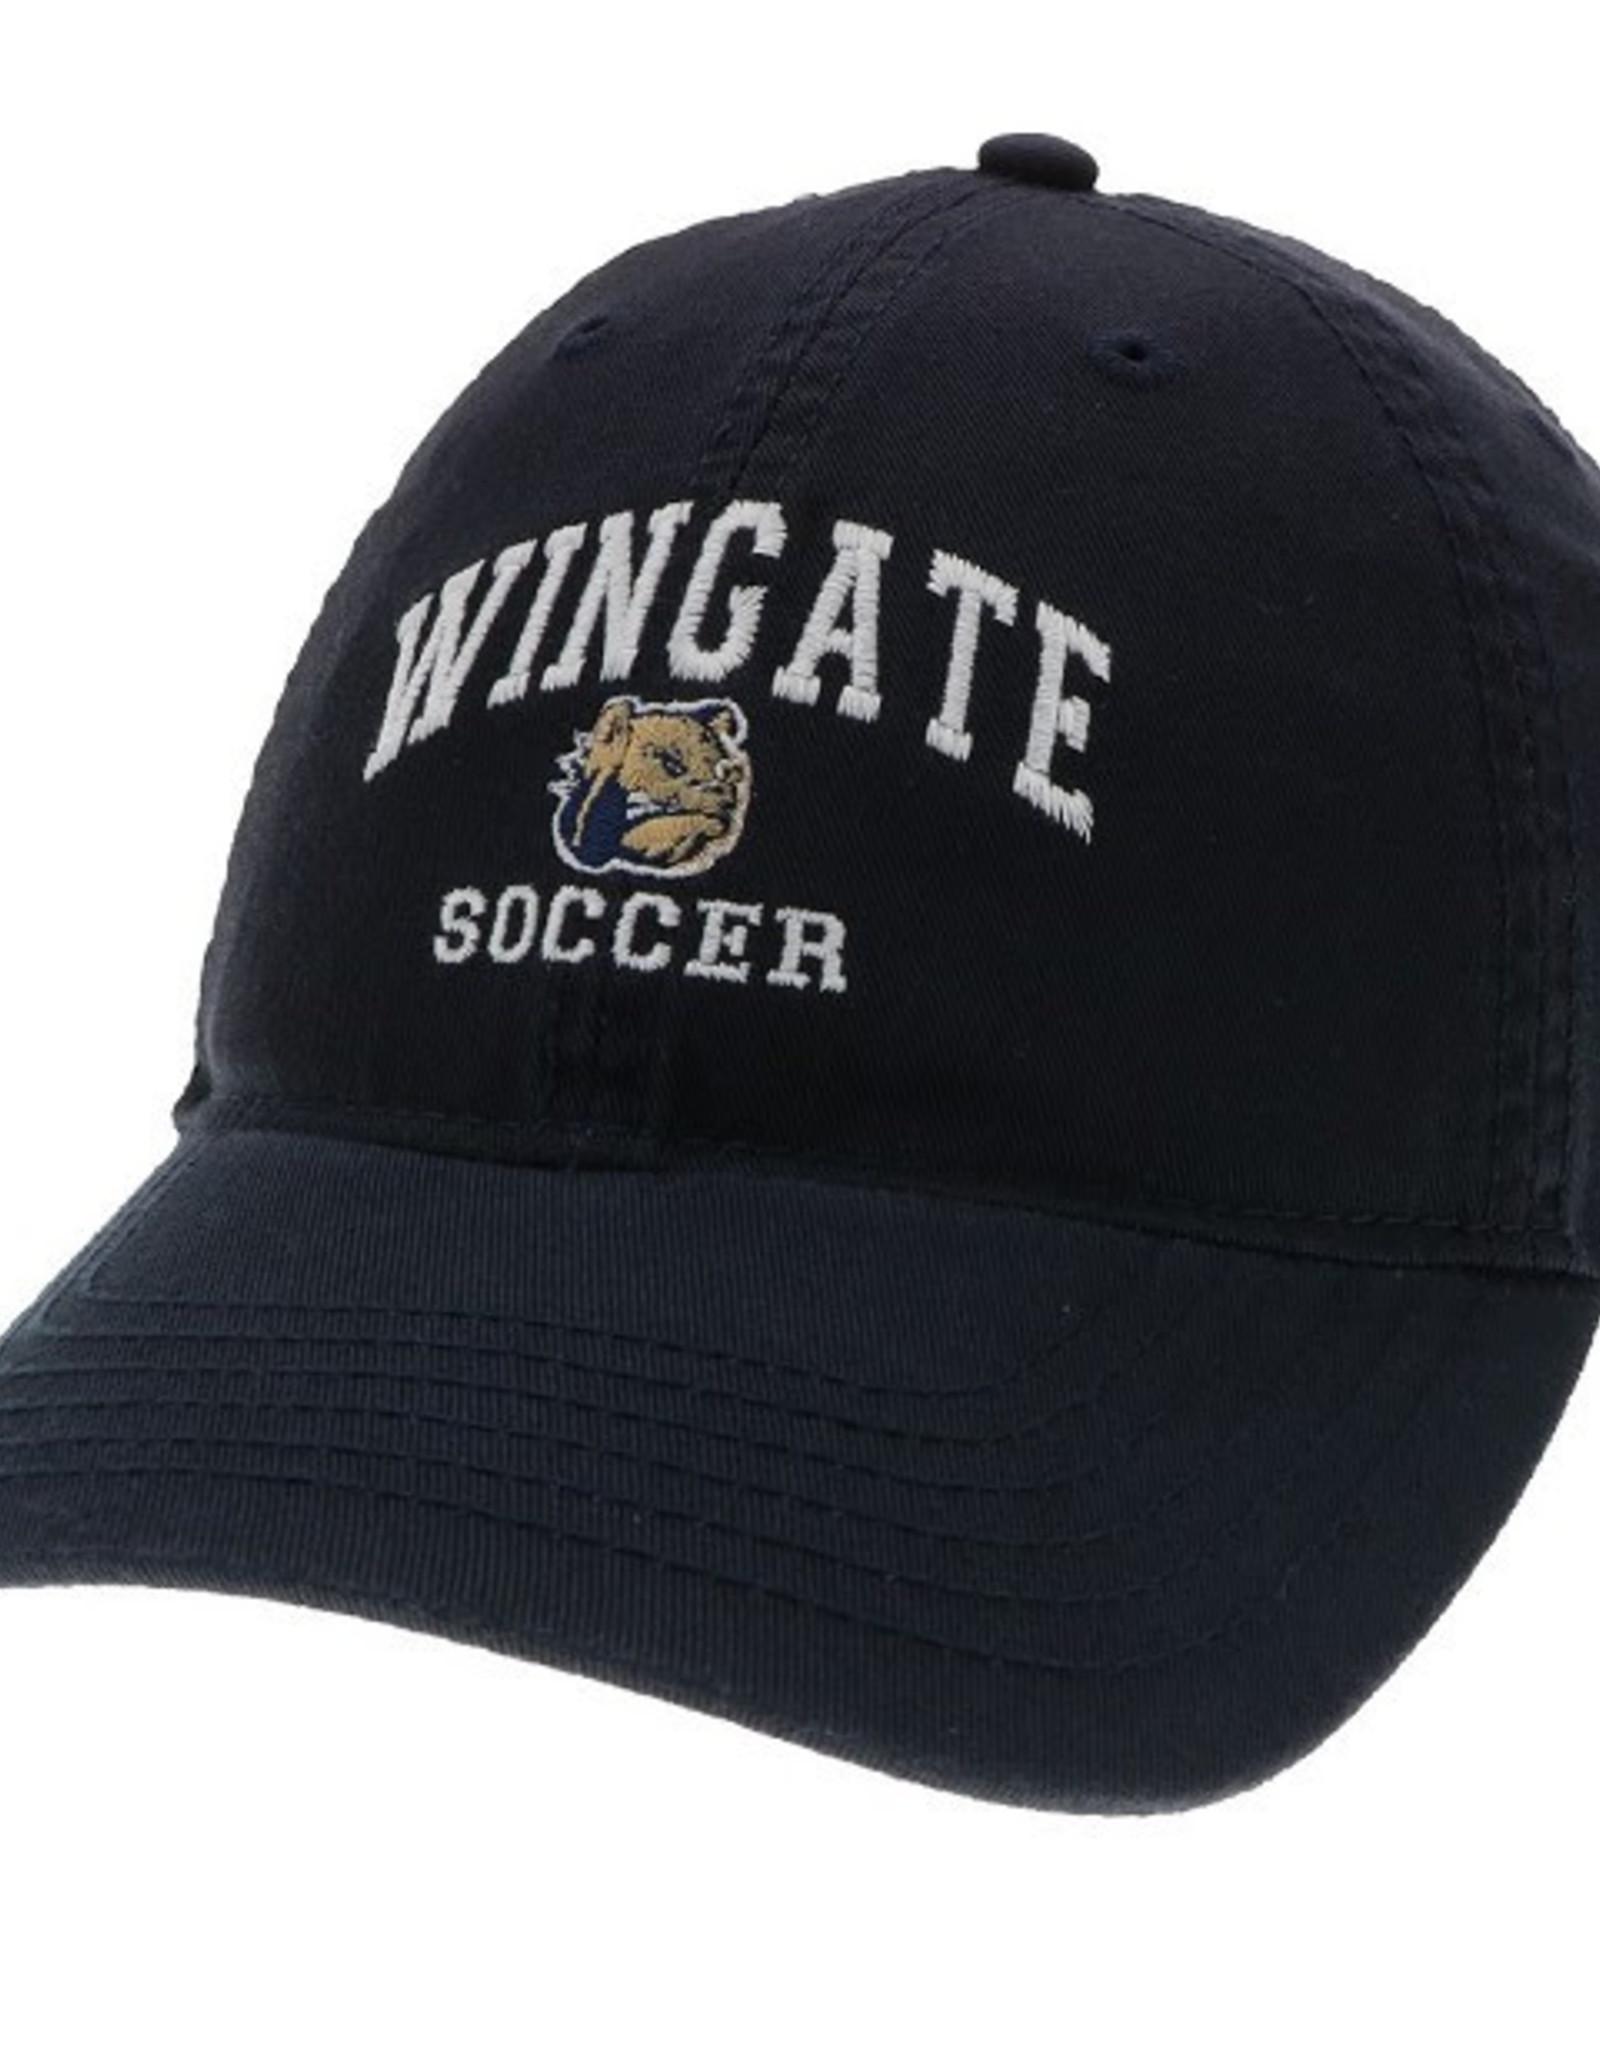 Deep Navy Wingate Dog Head Soccer Hat